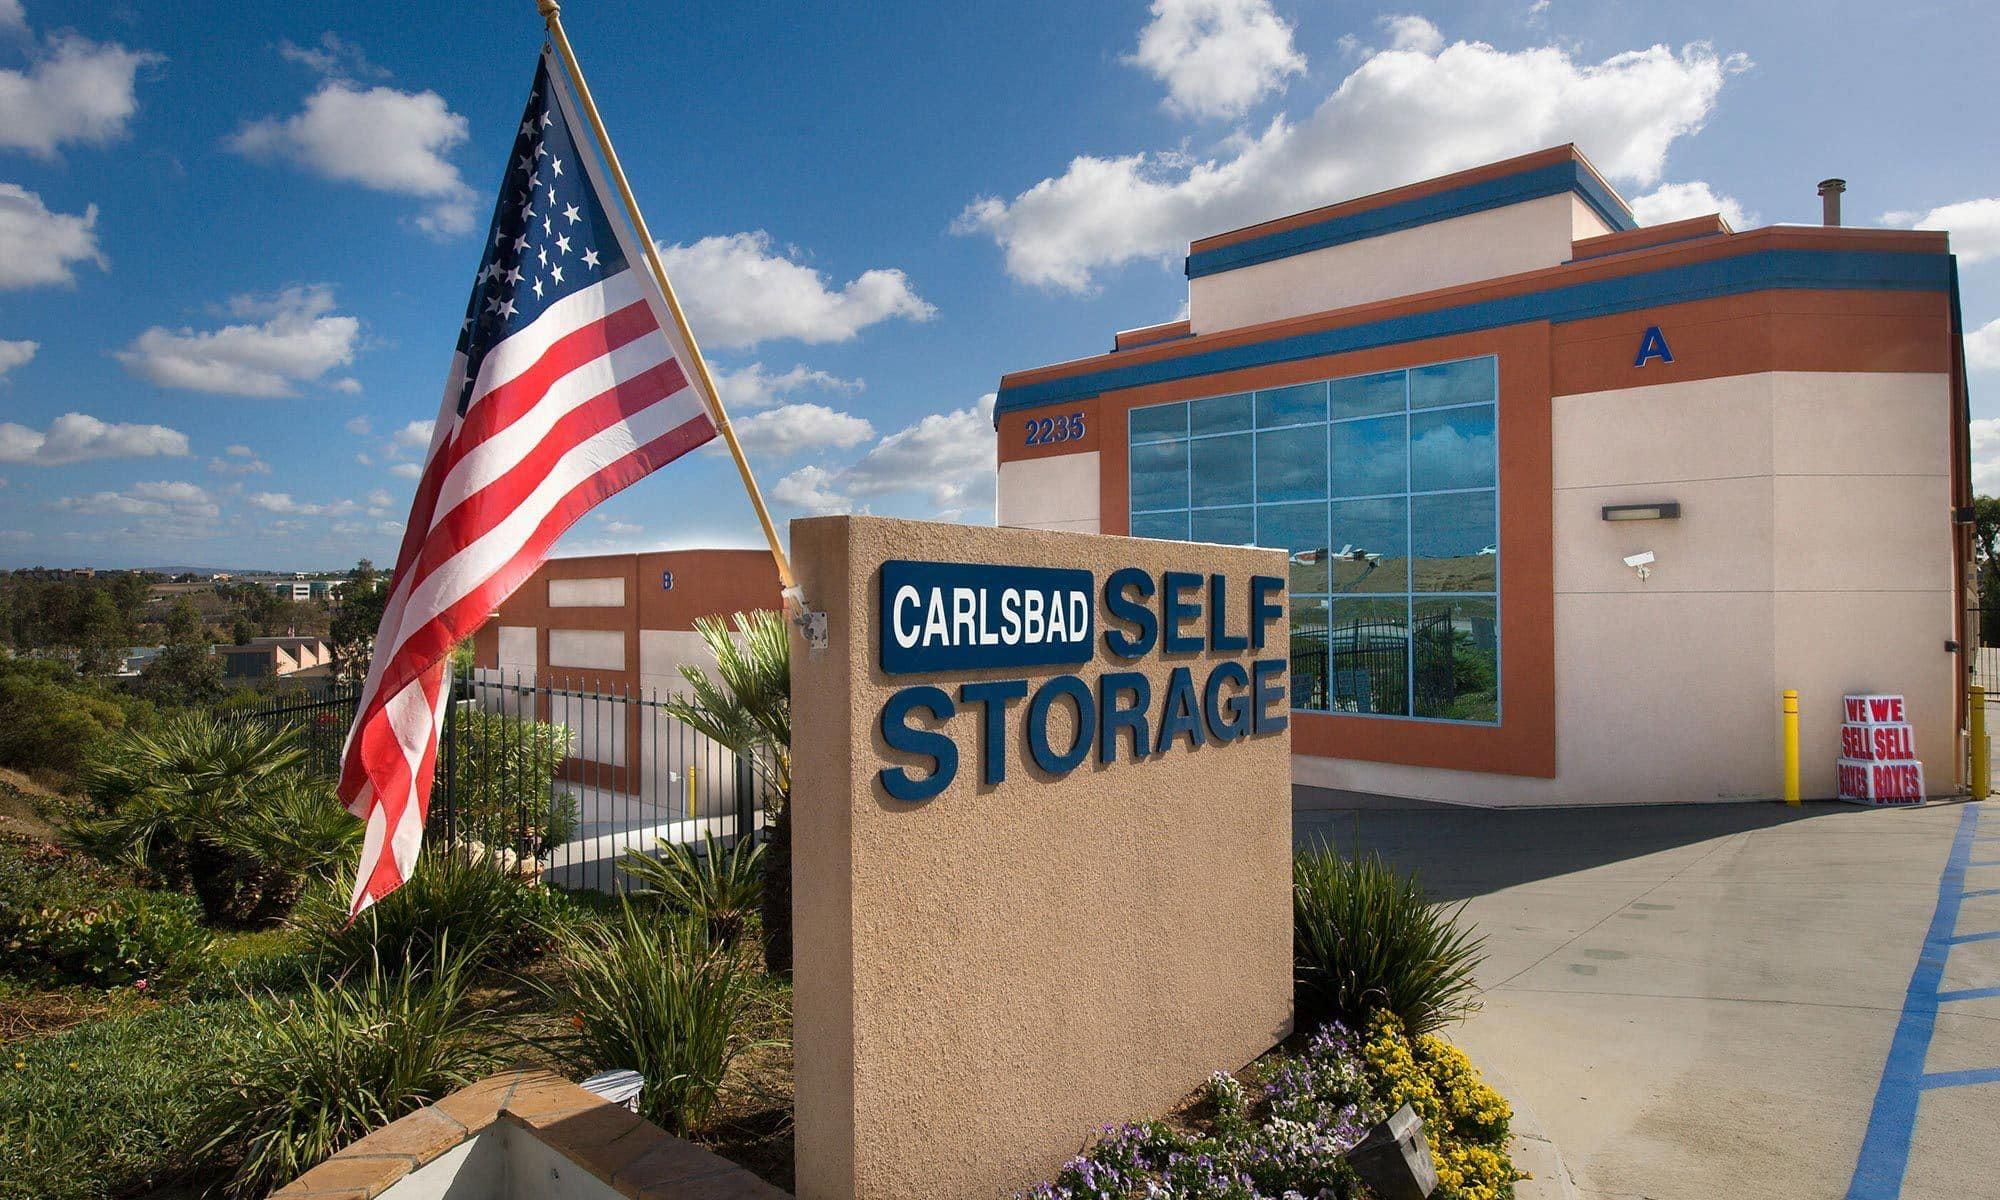 Self storage hero for Carlsbad